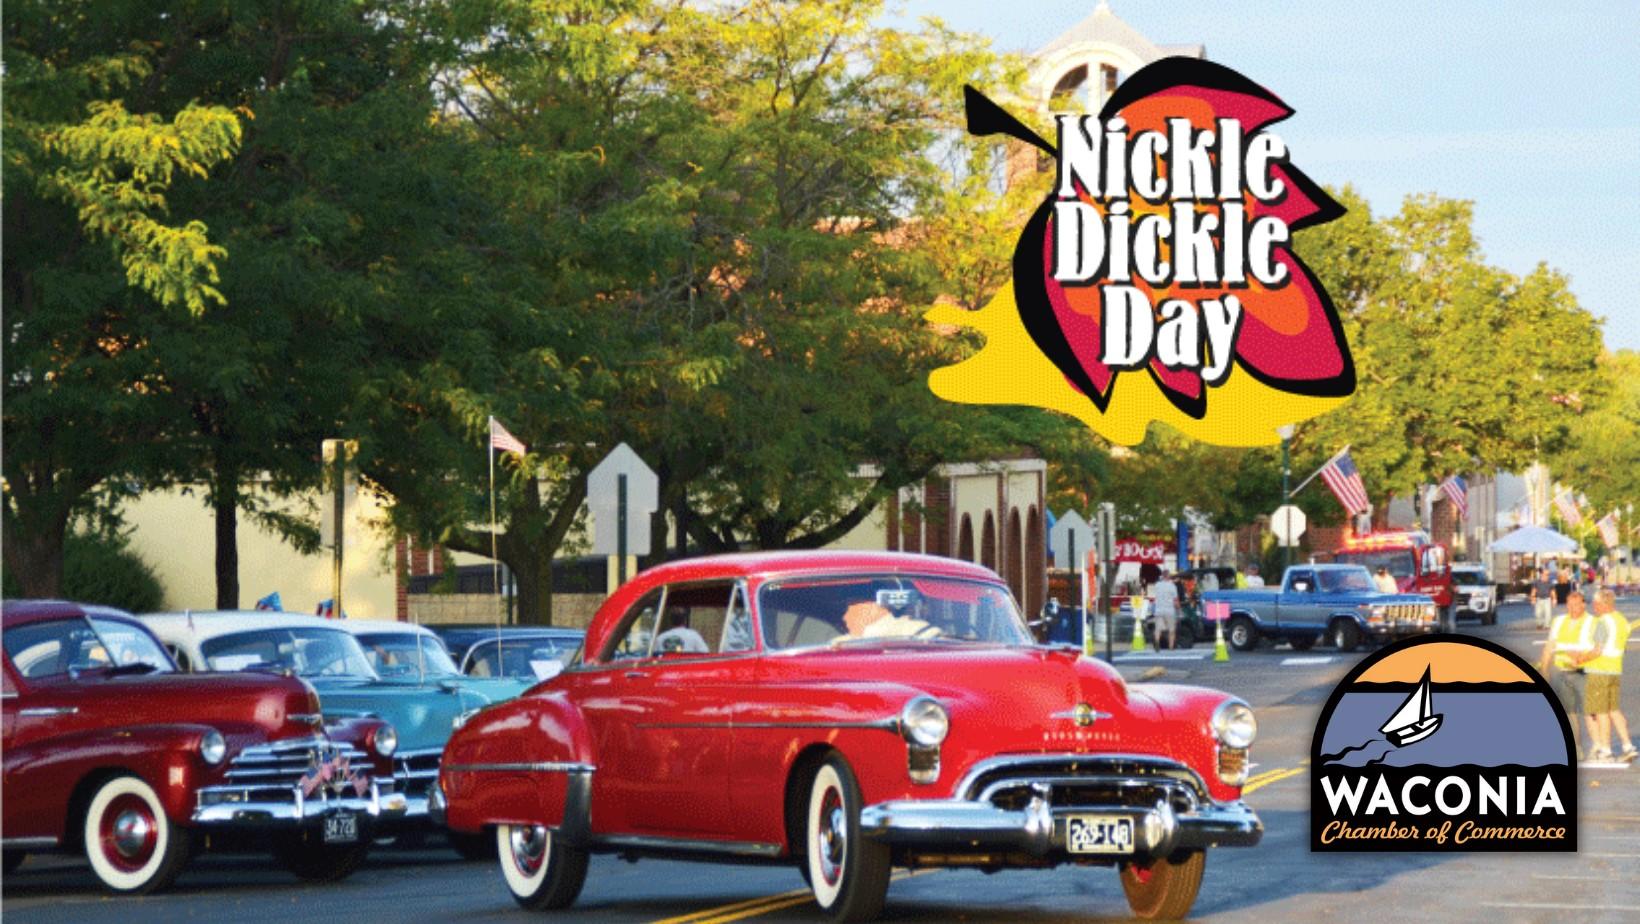 Nickle Dickle Days Car Show 2021